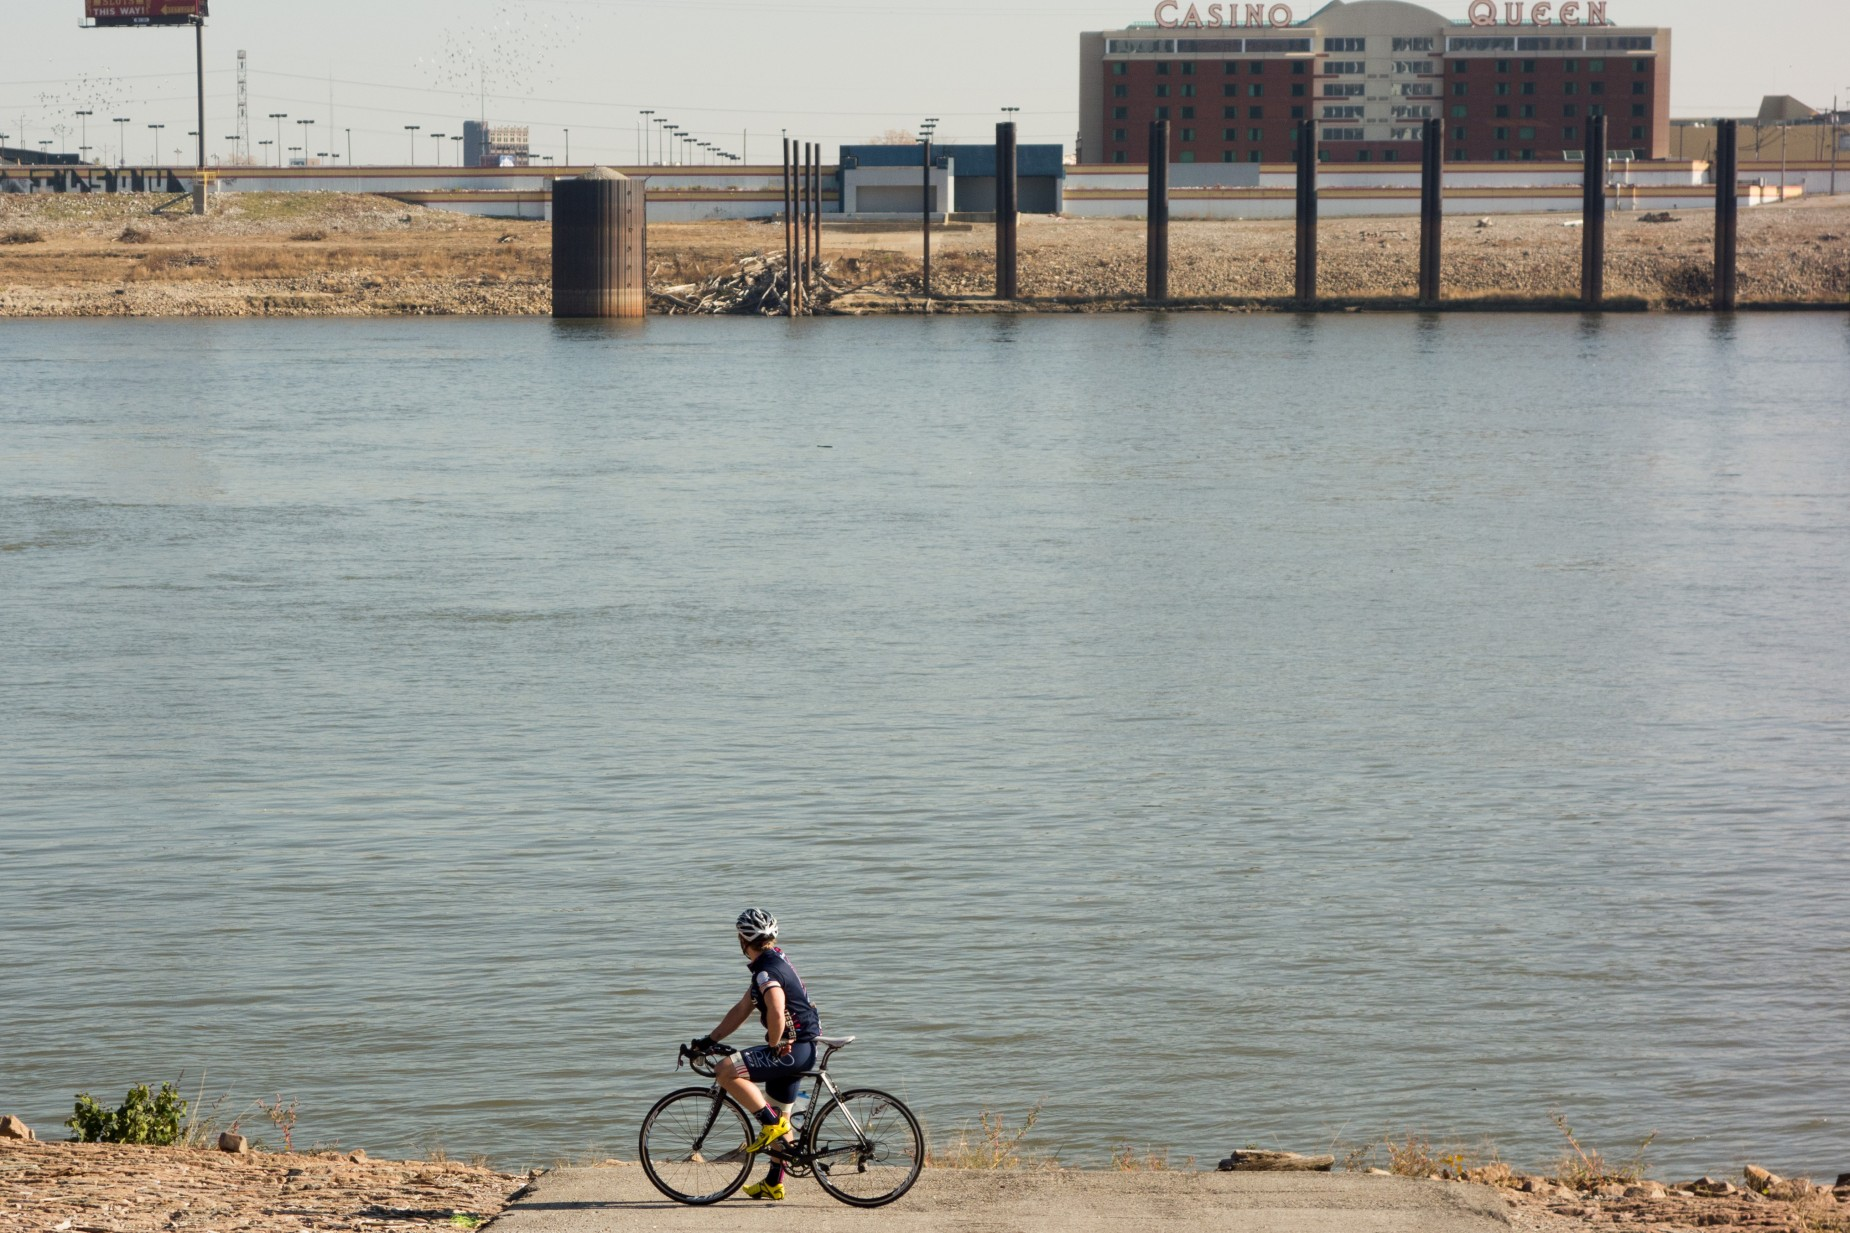 St-Louis-Bicycling-Riverview-Trail-12-1850x1233.jpg